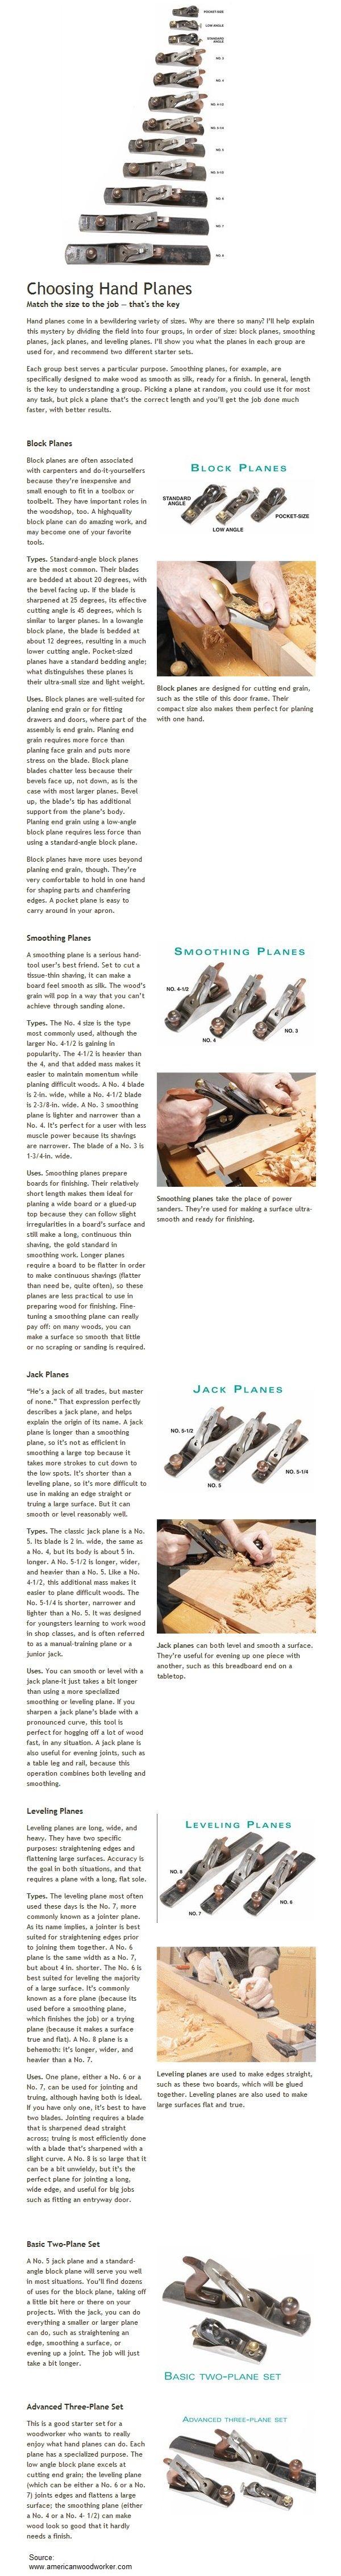 Choosing Hand Planes | WoodworkerZ.com